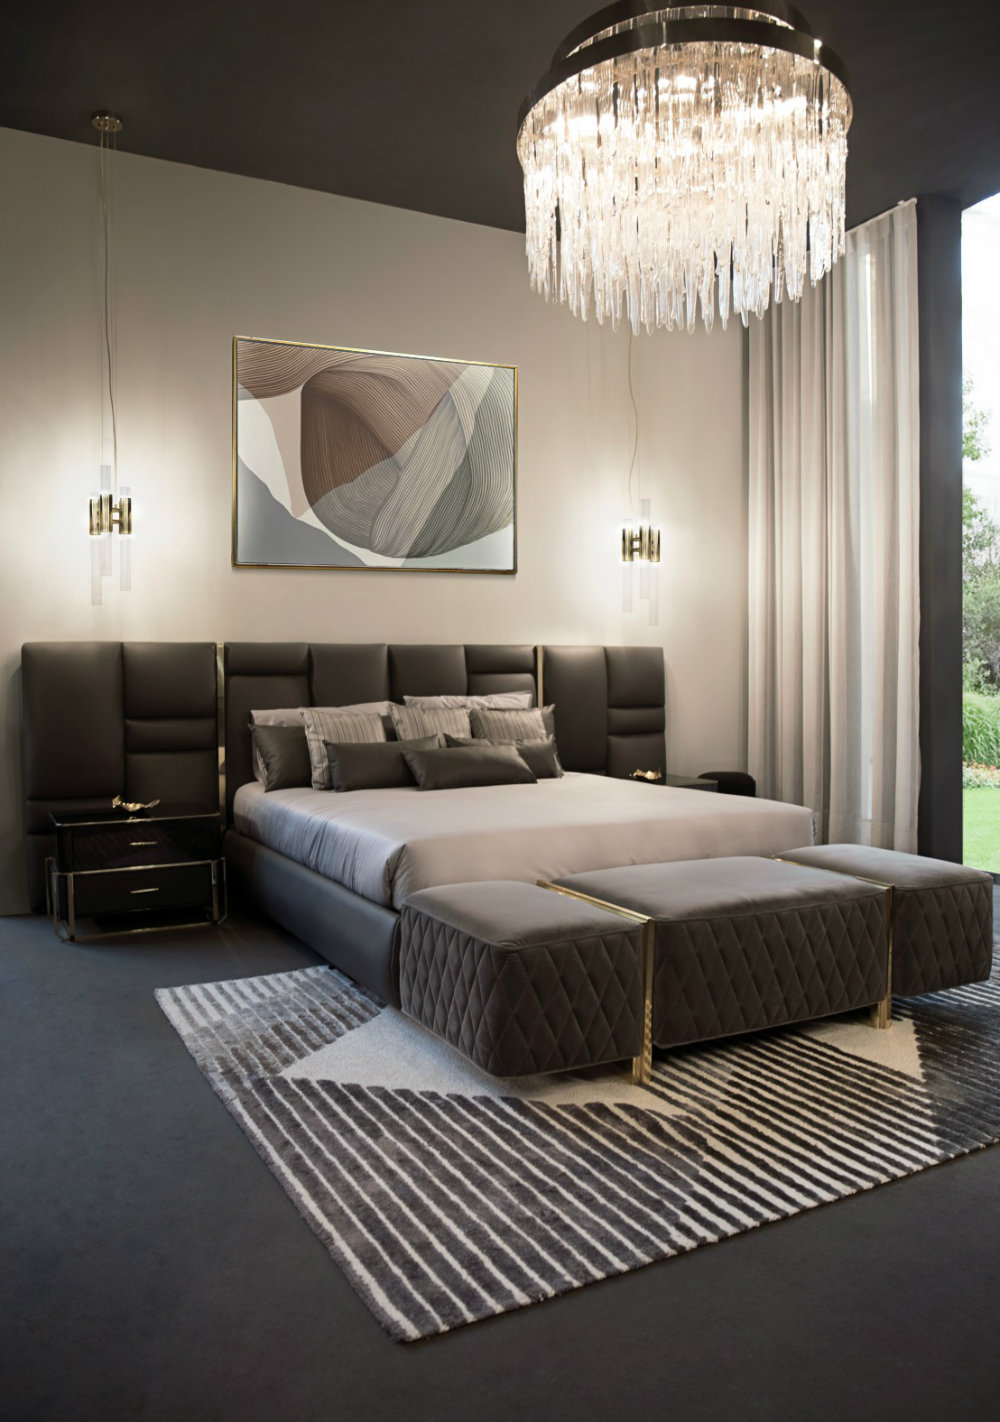 Bedroom Lighting Ideas For A Dreamy Master Bedroom Com Imagens